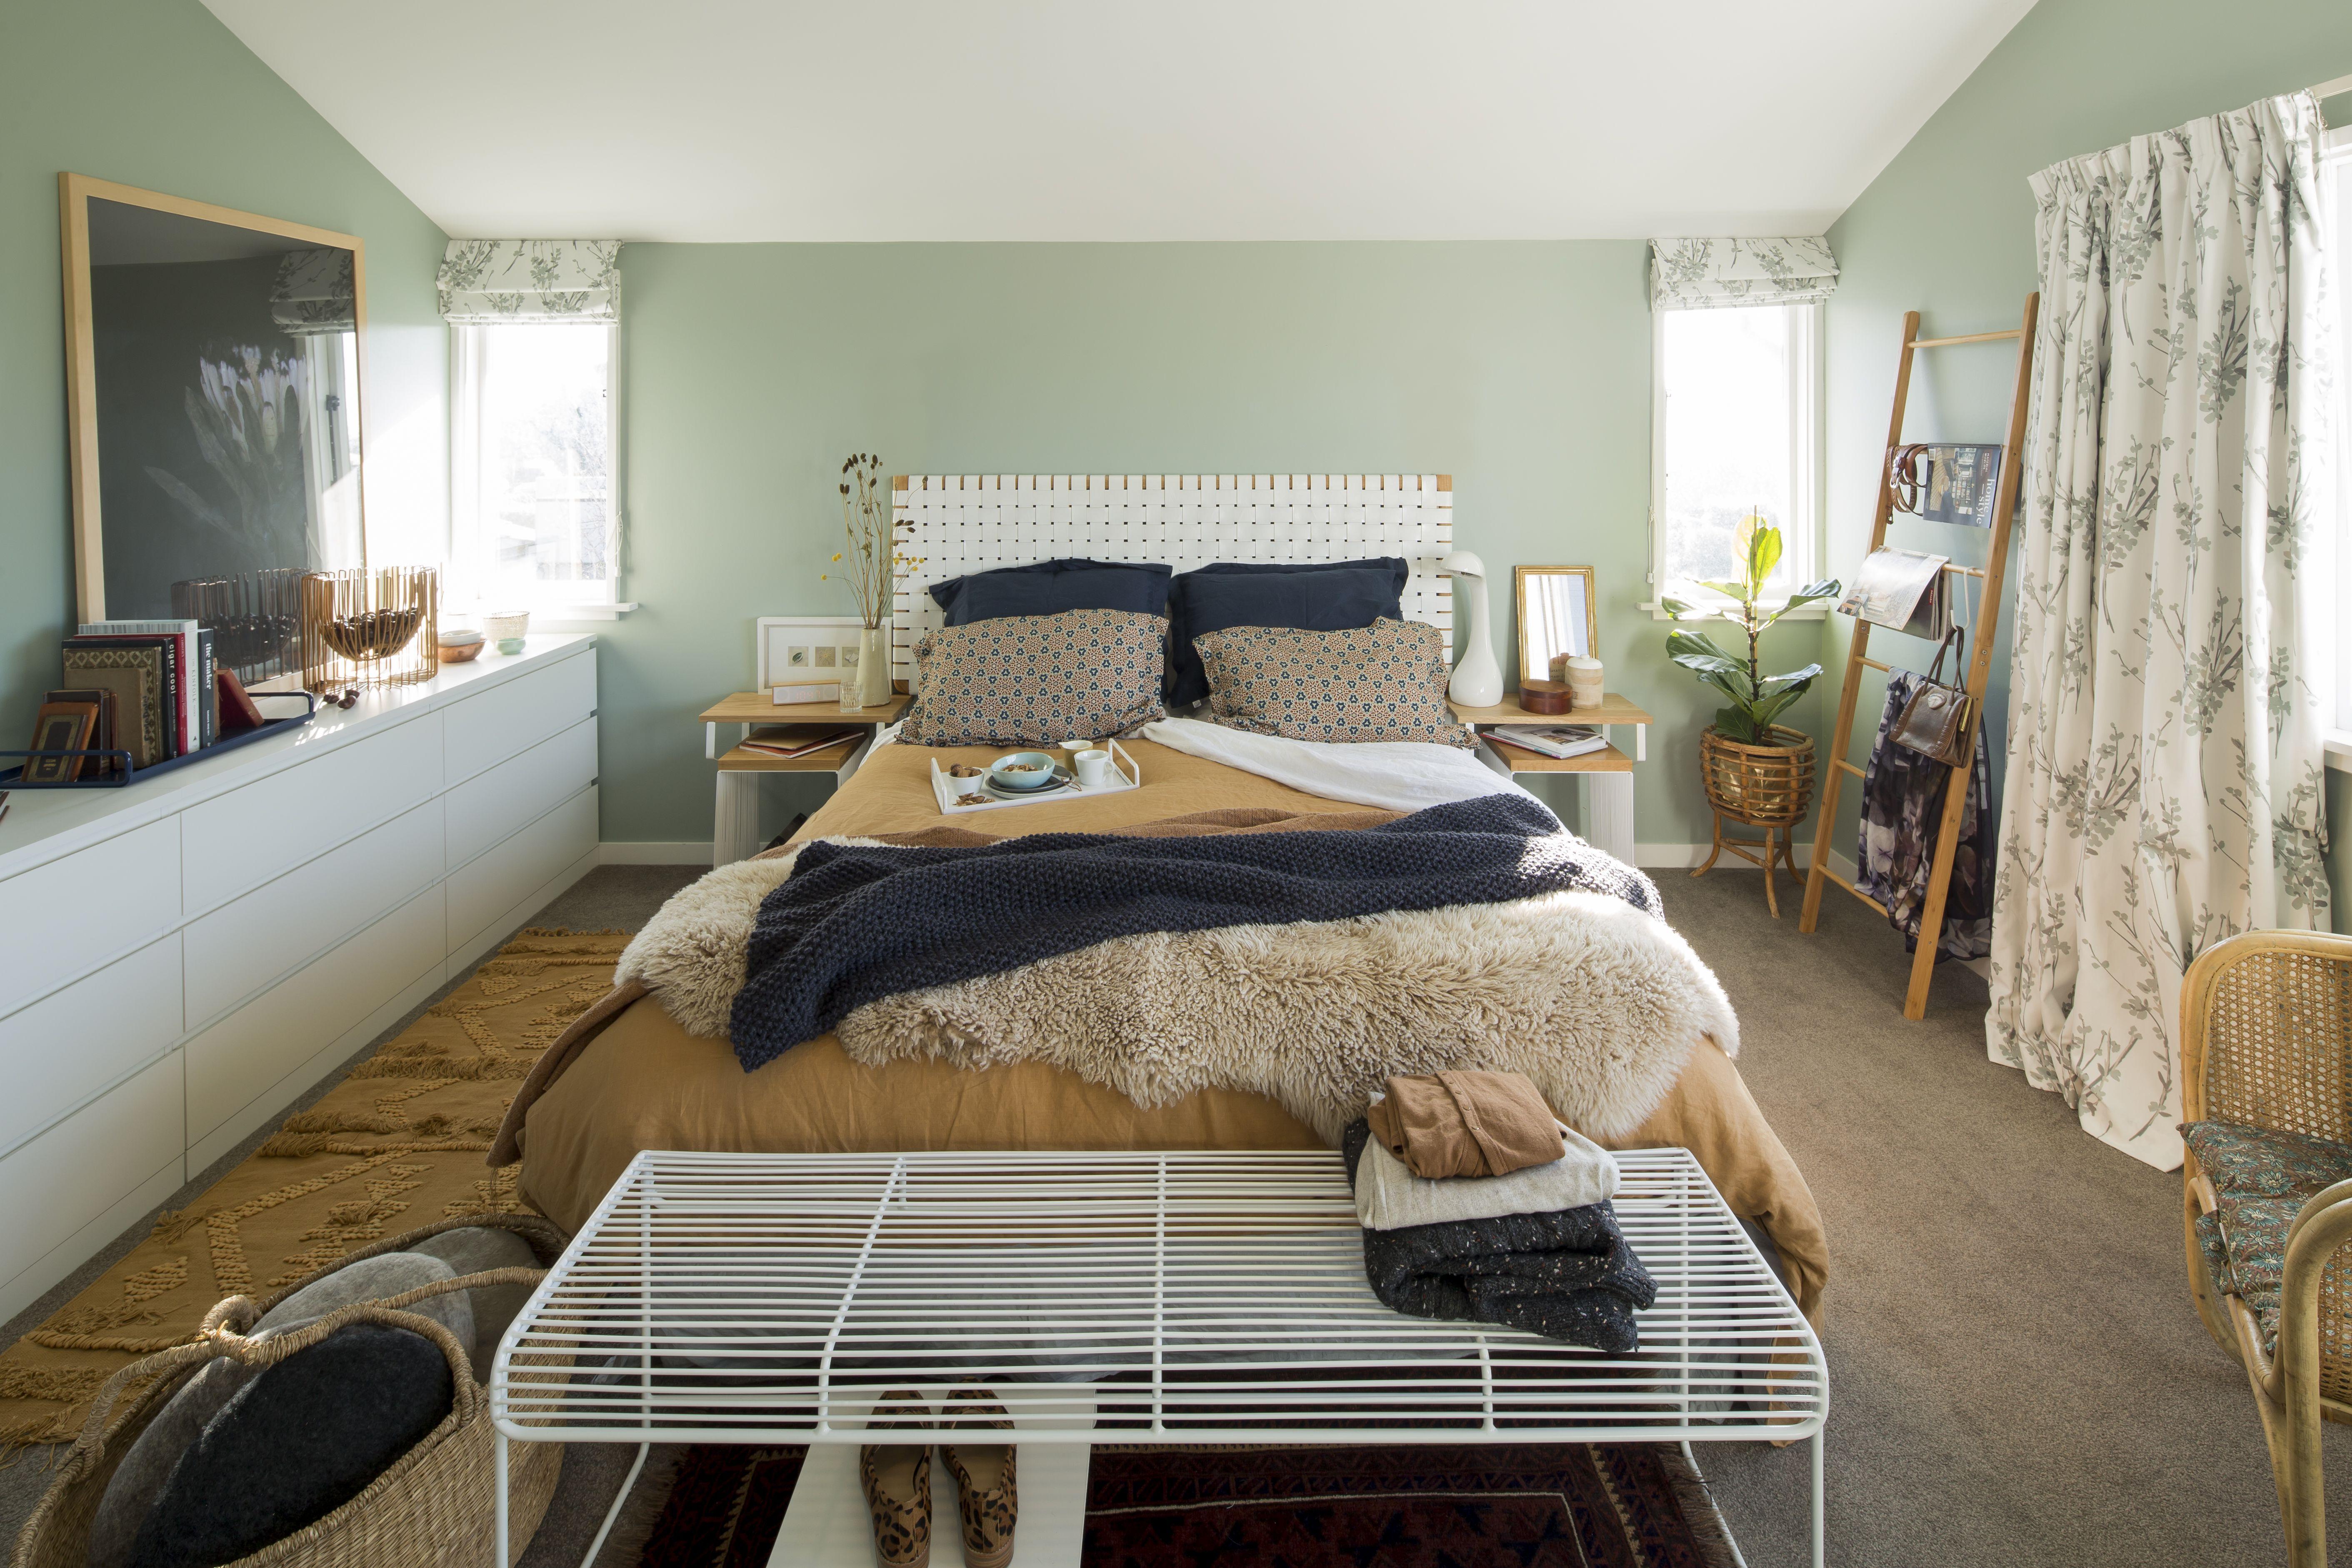 Benmore Bench Seat Furniture Seating Bedroom Design